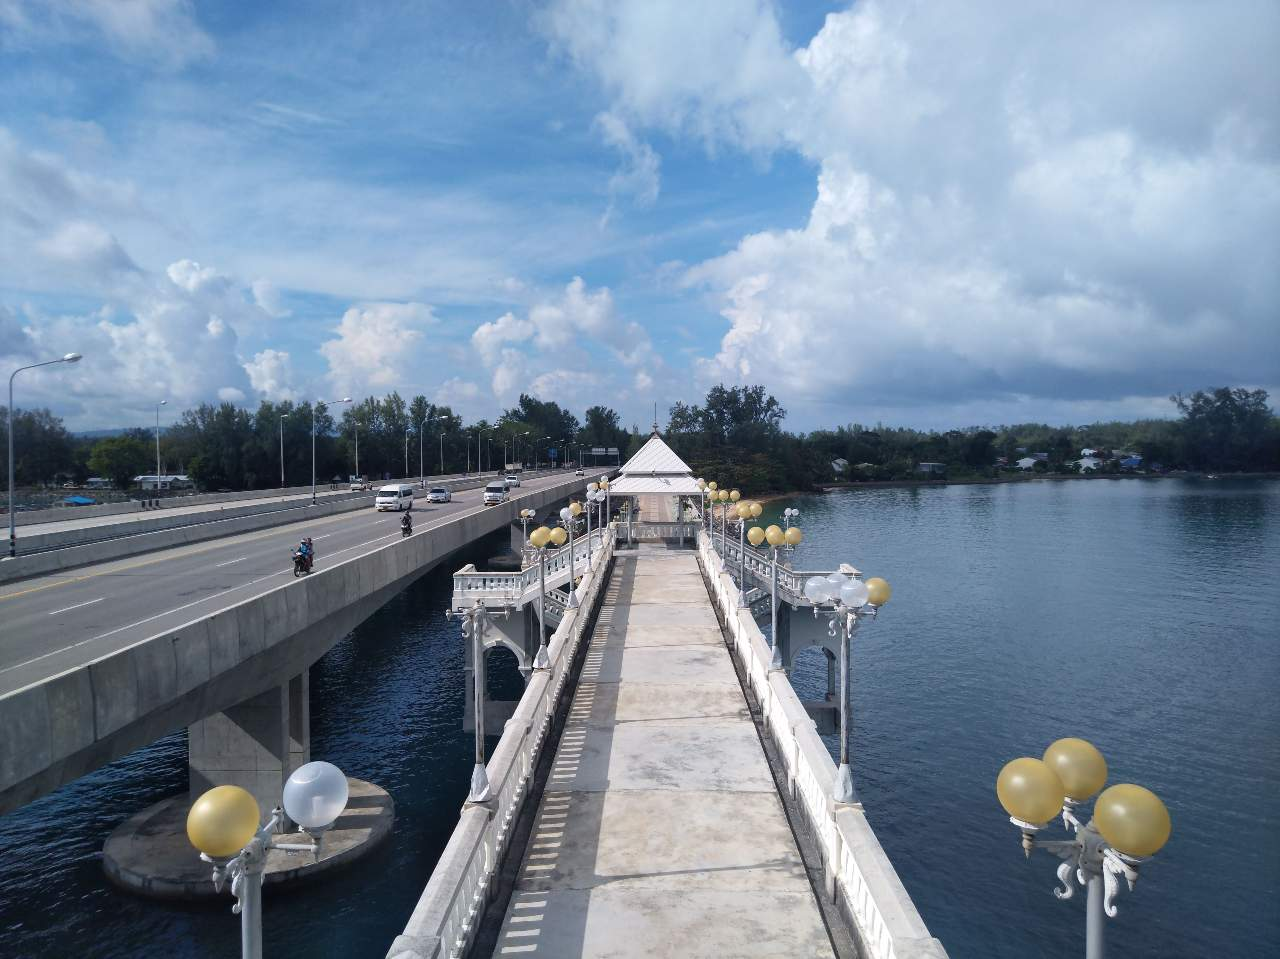 The elevated section of the old Sarasin Bridge on Phuket